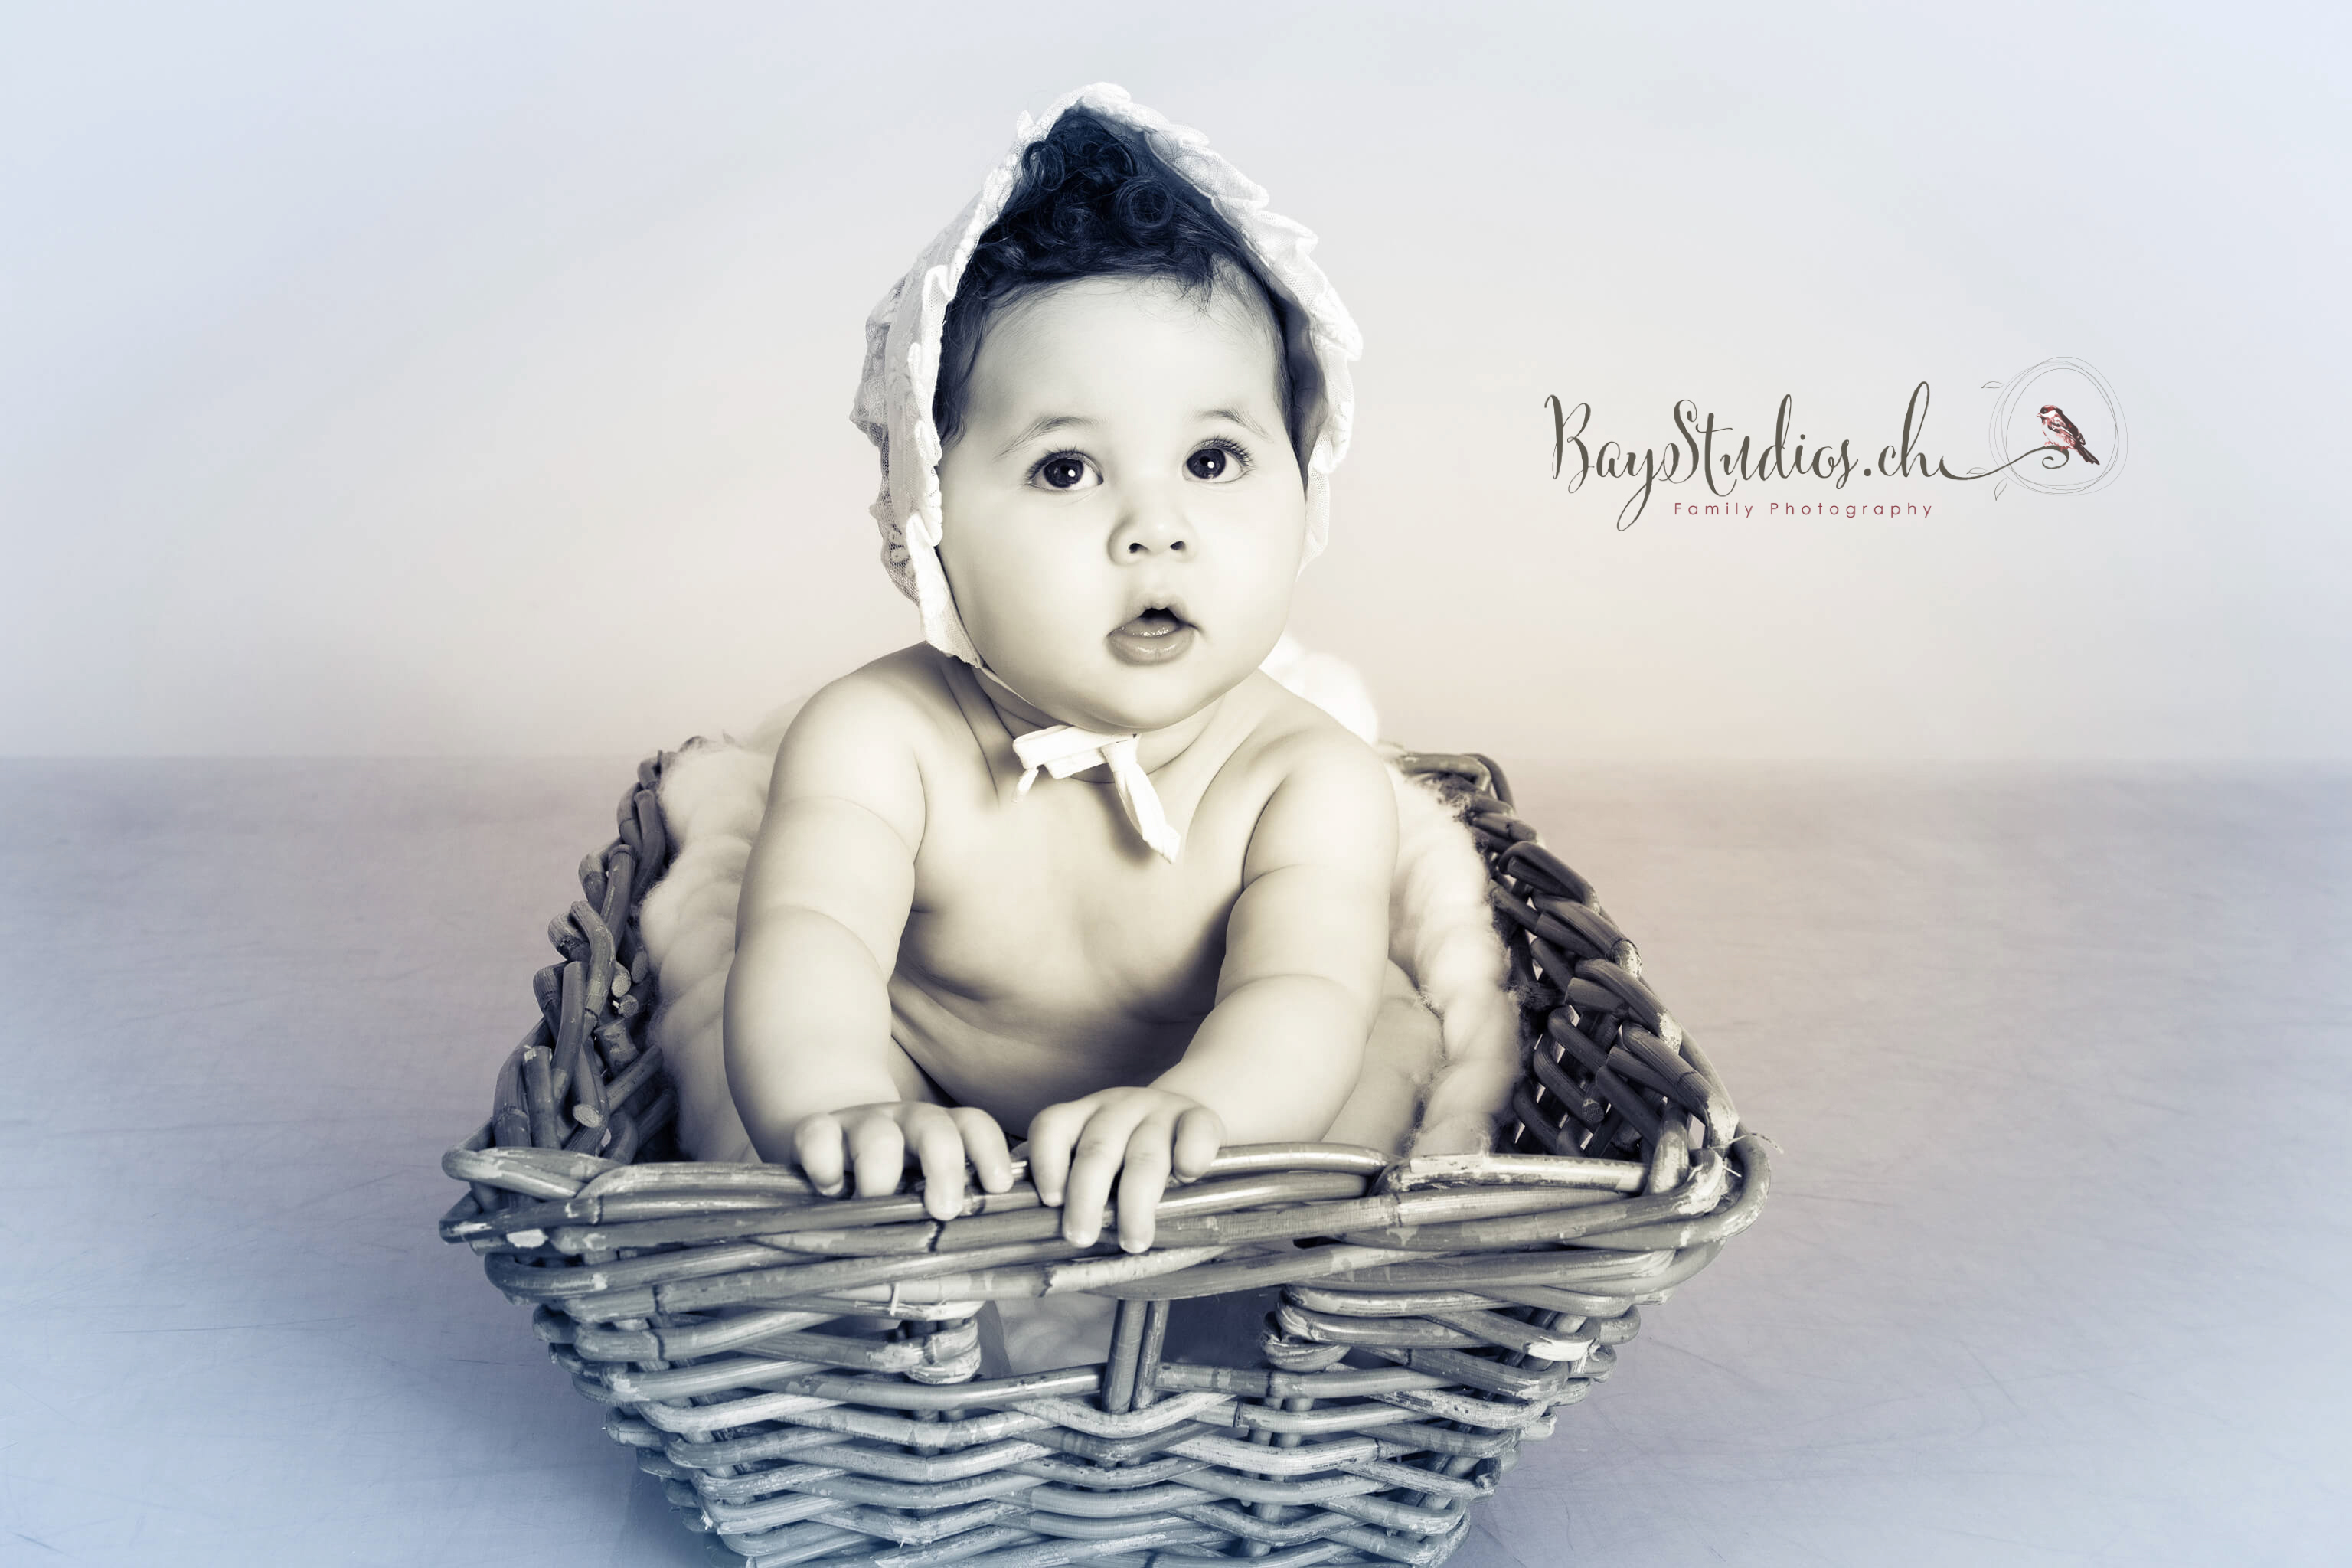 fotograf,familie_fotograf,_fotograf_aarau,_fotograf_zürich,_baby_fotograf,bay_studios,_bay_studios_f